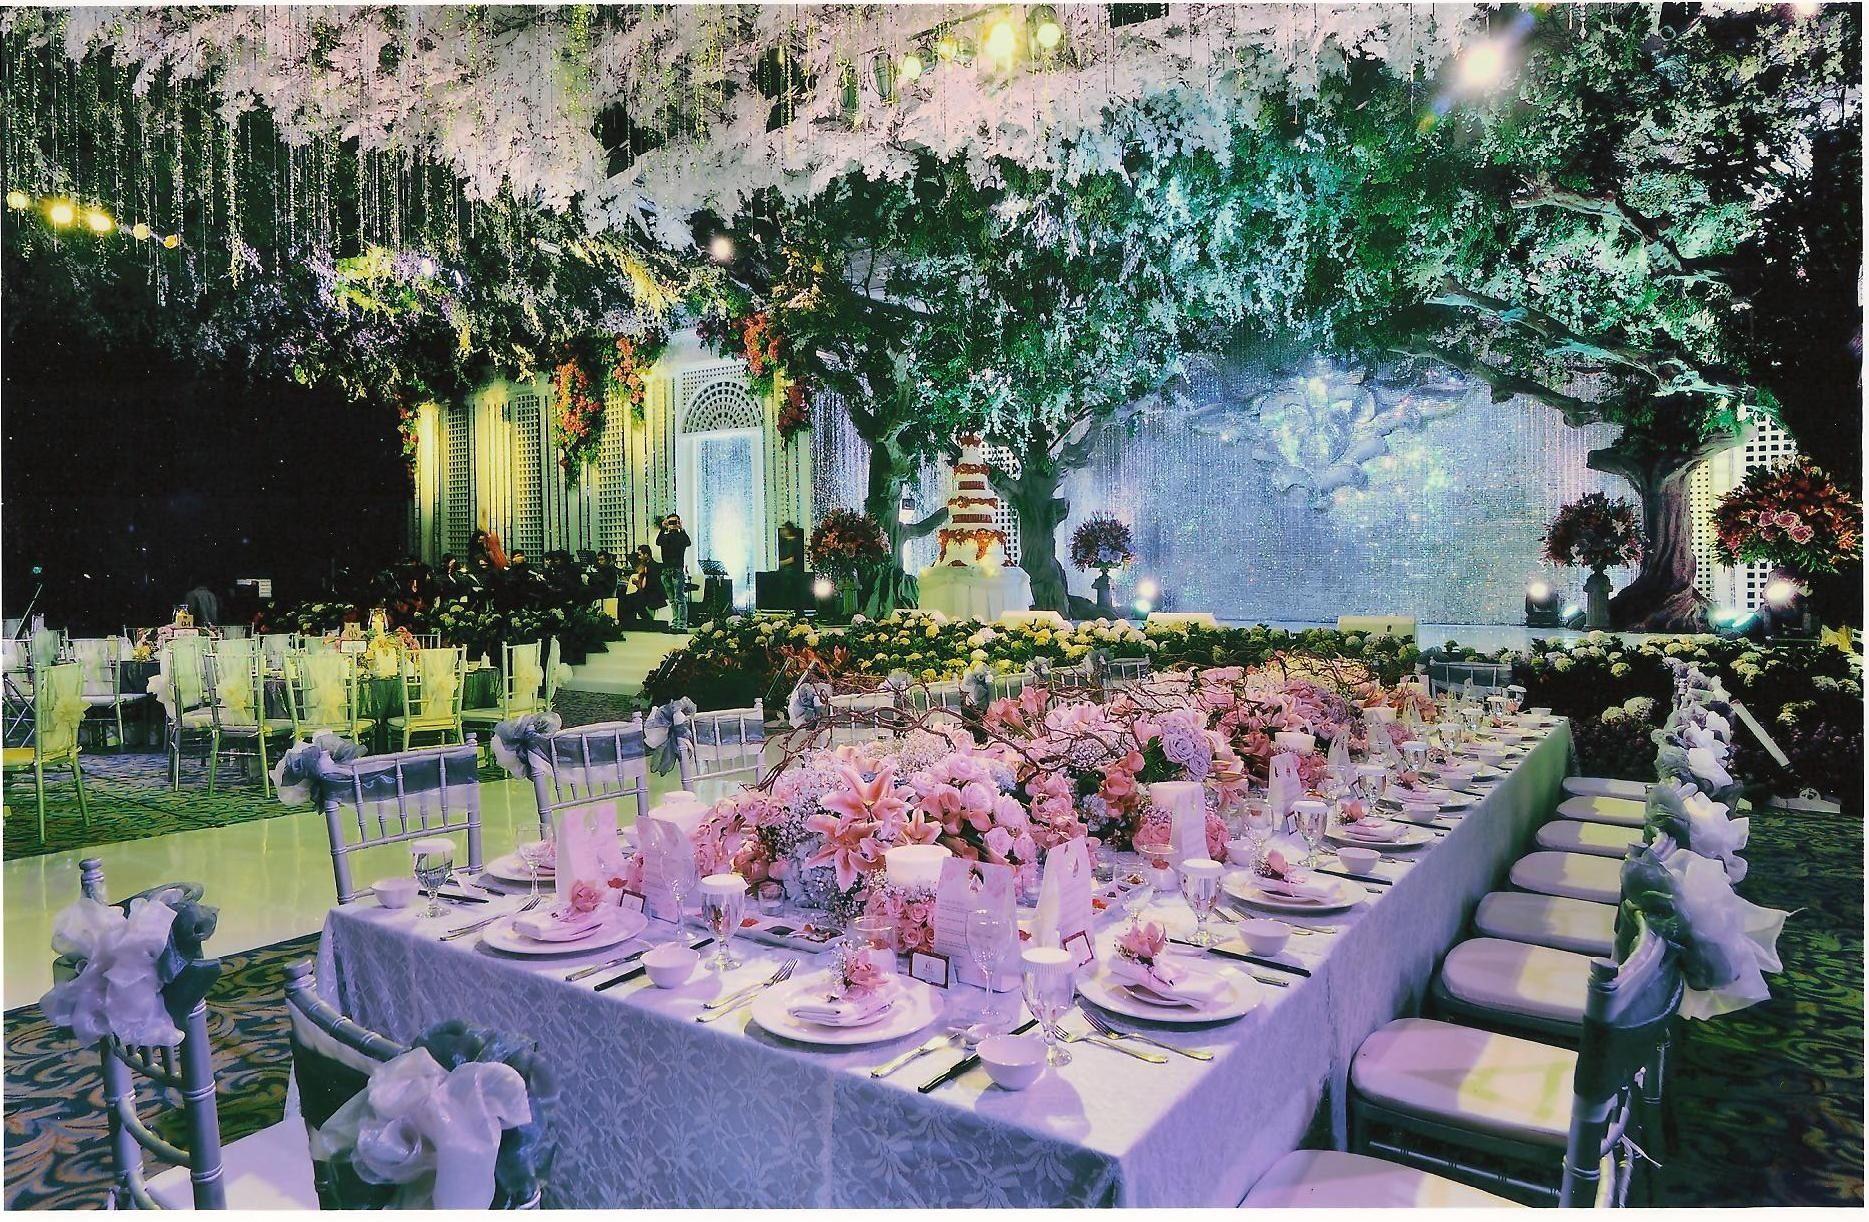 Wedding decoration surabaya grand city by suryanto decoration wedding decoration surabaya grand city by suryanto decoration bridestory junglespirit Choice Image